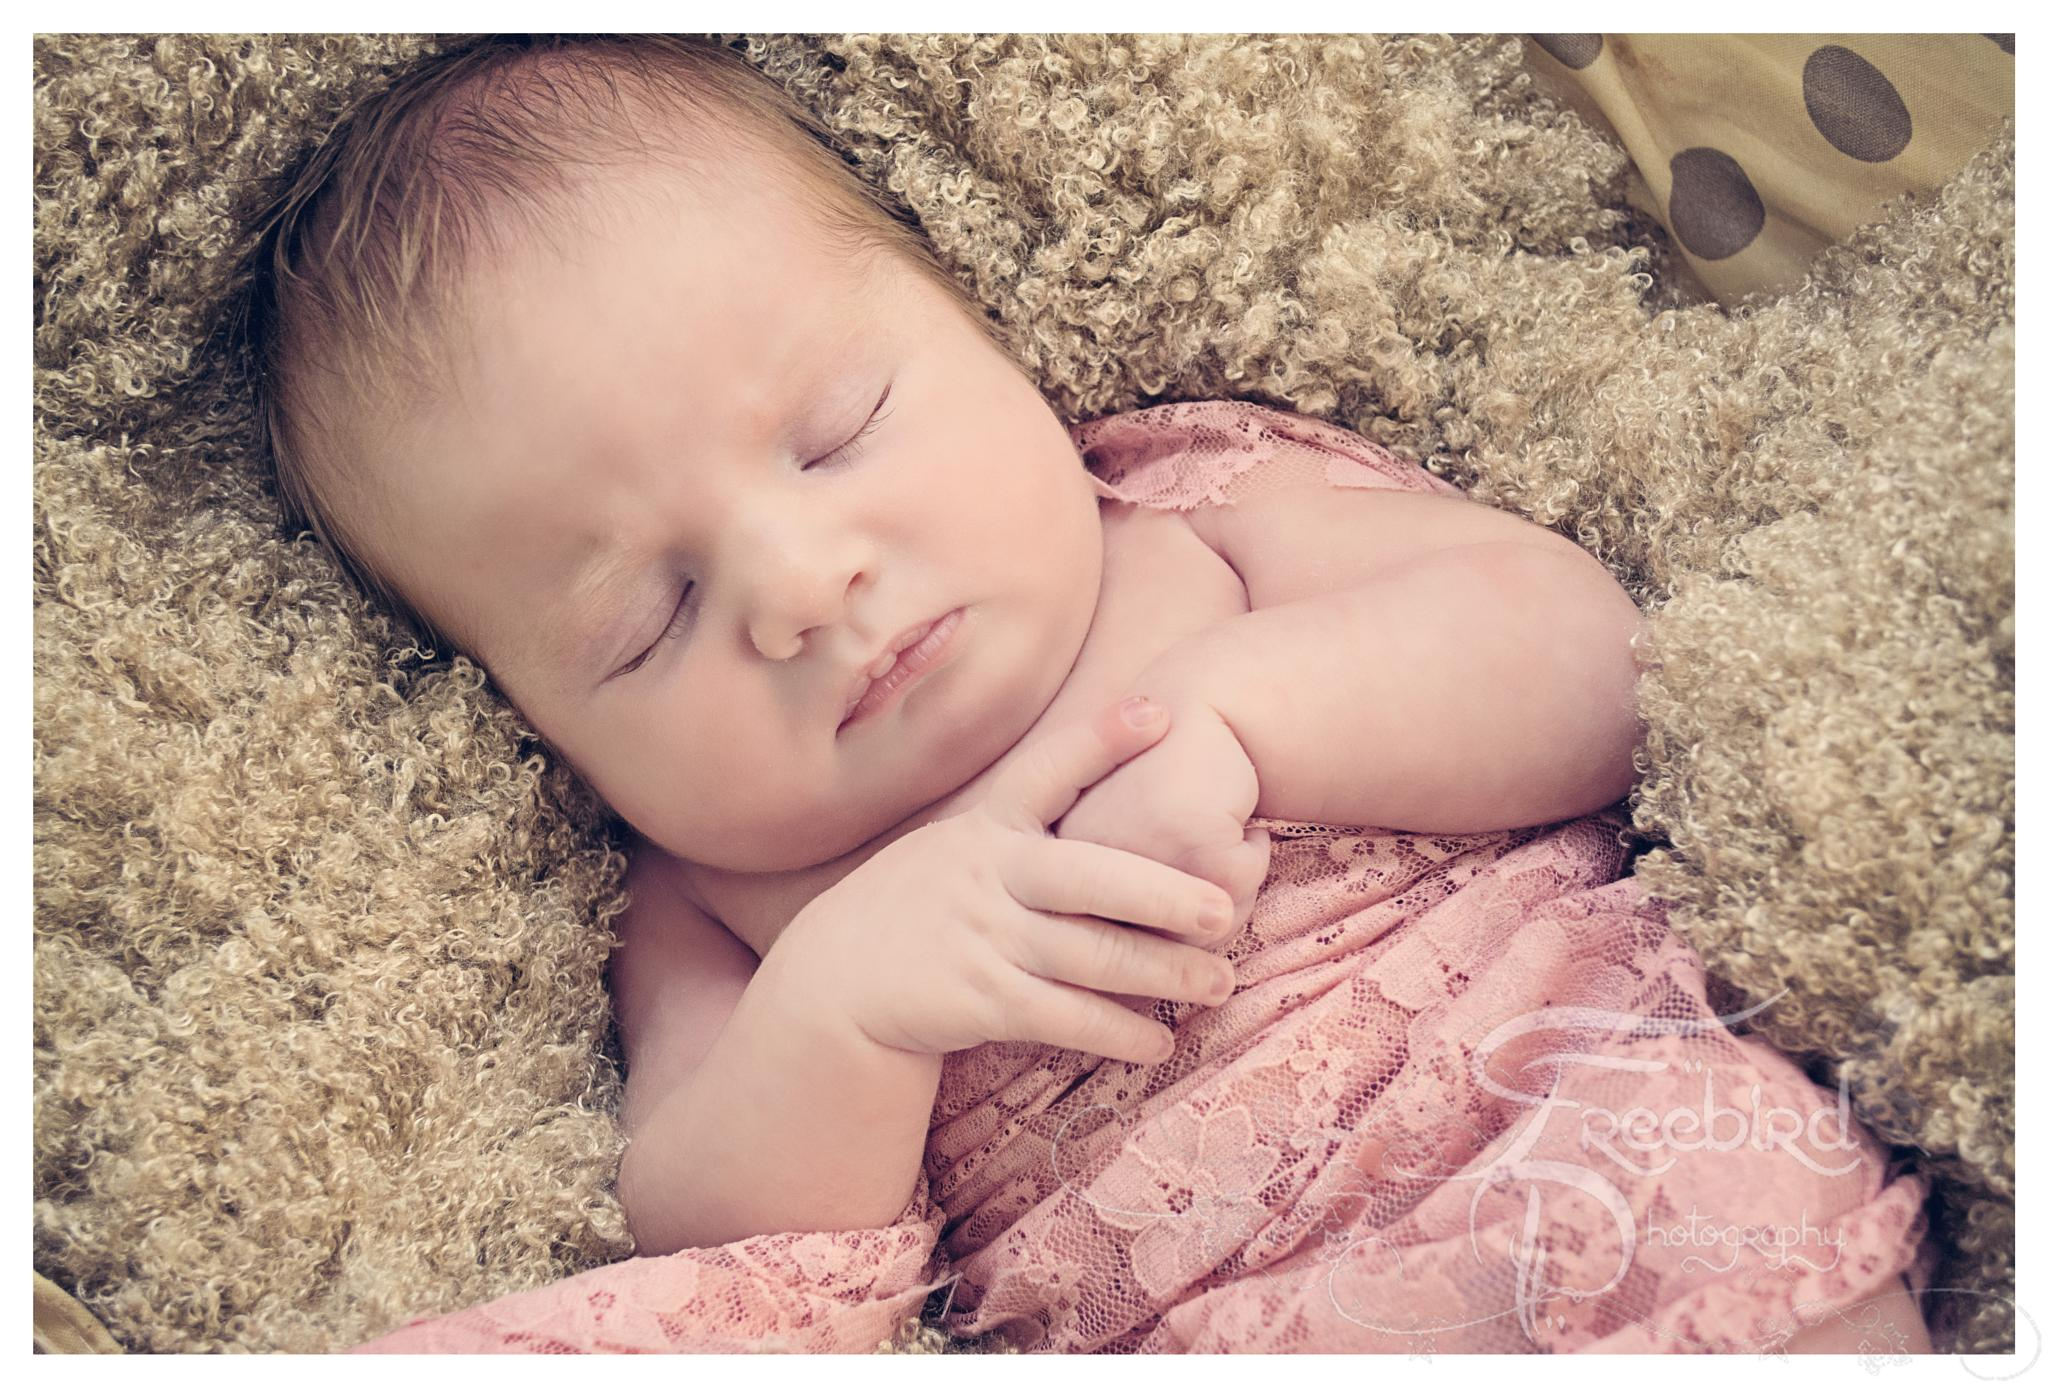 Sleeping Princess by FreebirdphotographyUK